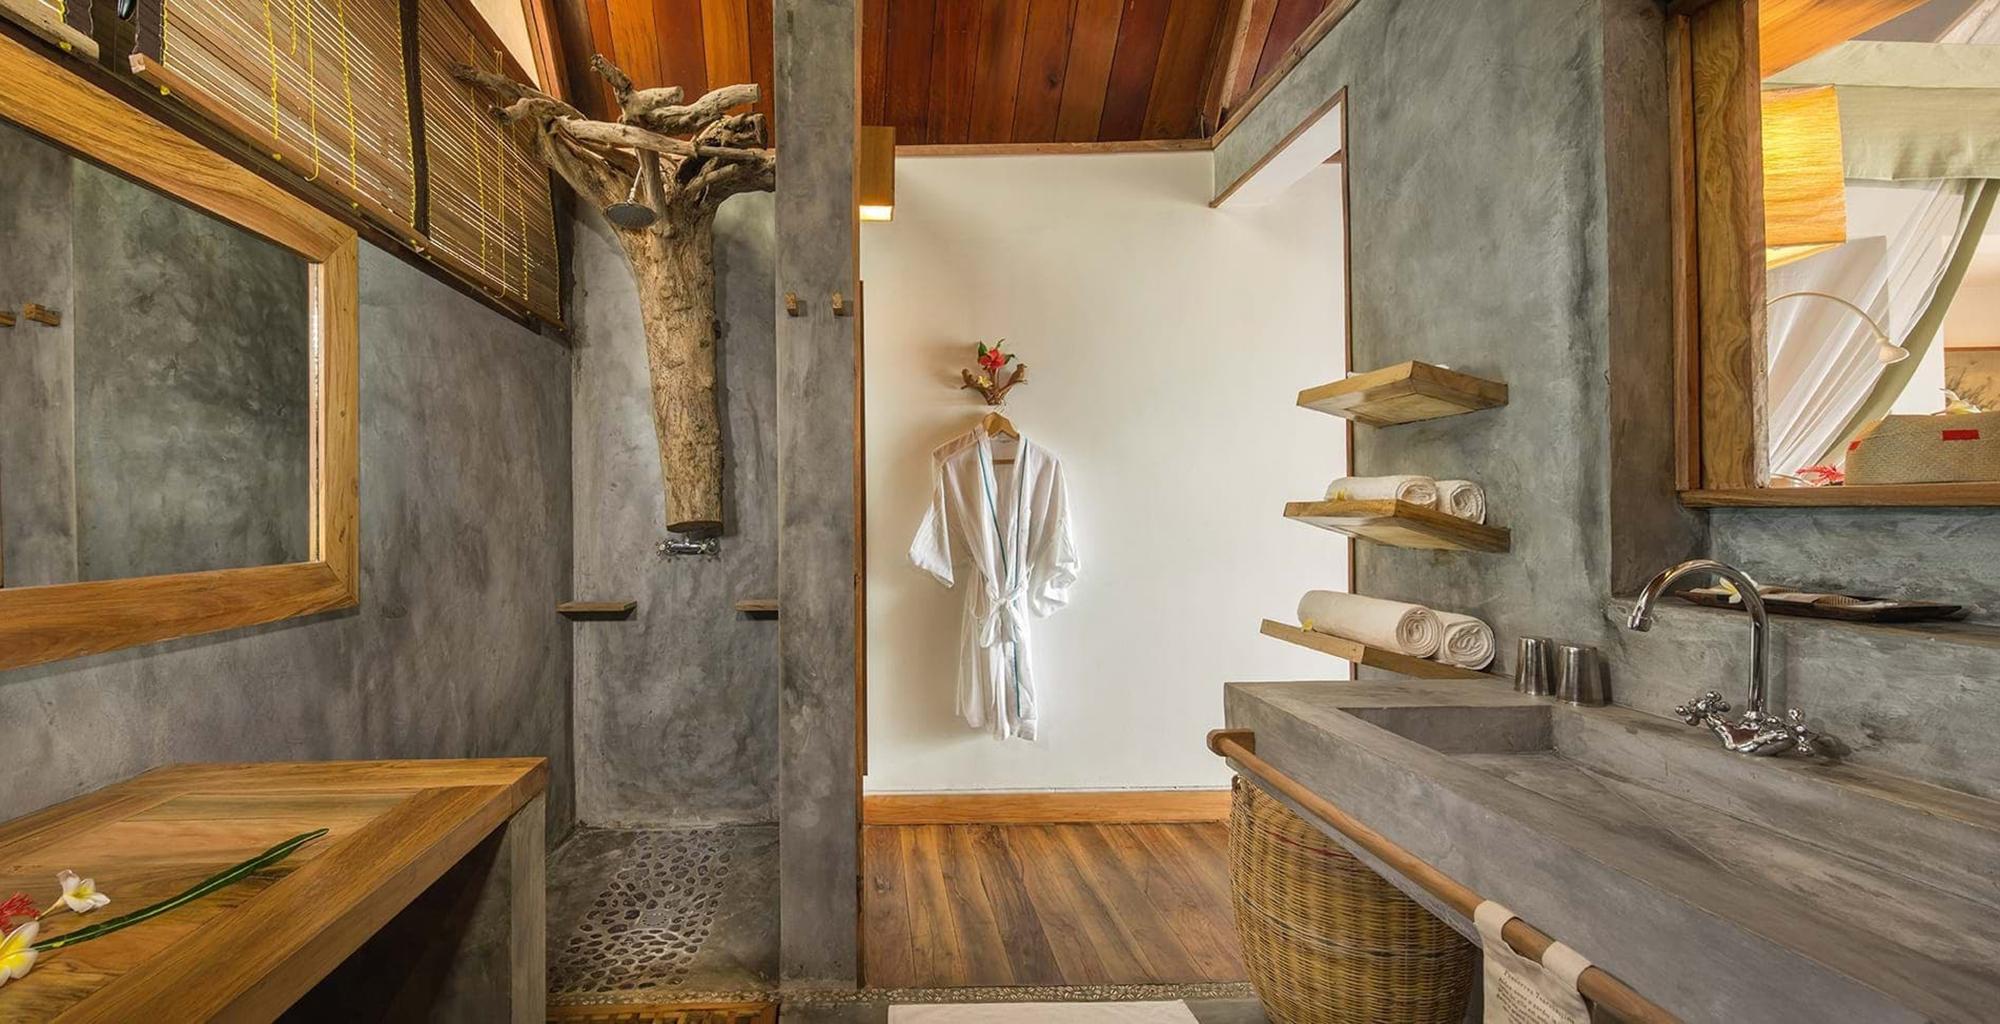 Madagascar-Constance-Tsarabanjina-Bathroom